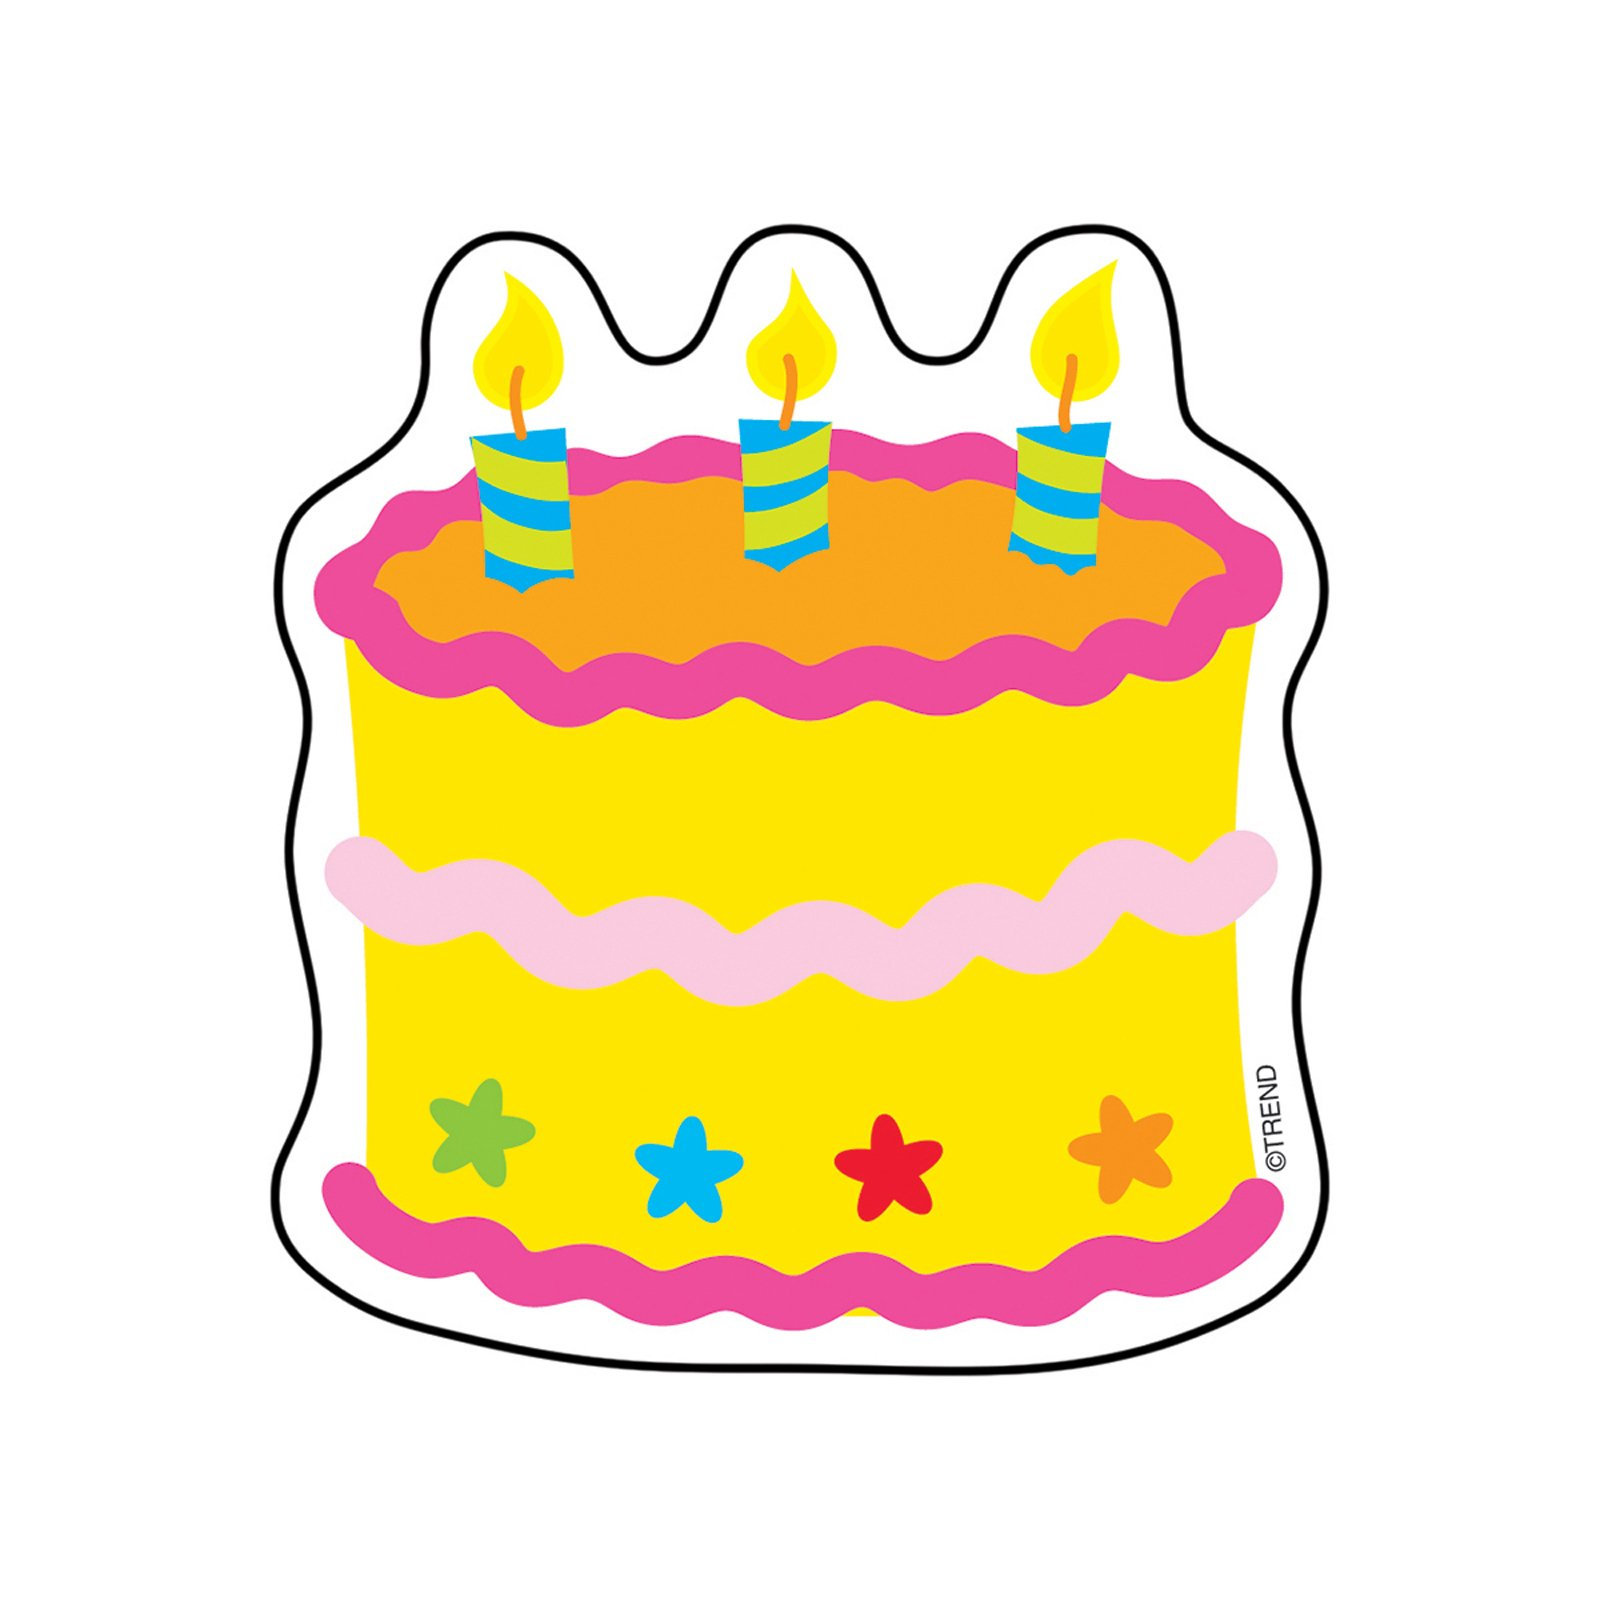 TREND enterprises, Inc. T-10505BN Birthday Cake Mini Accents, 36 Per Pack, 12 Packs by TREND Enterprises